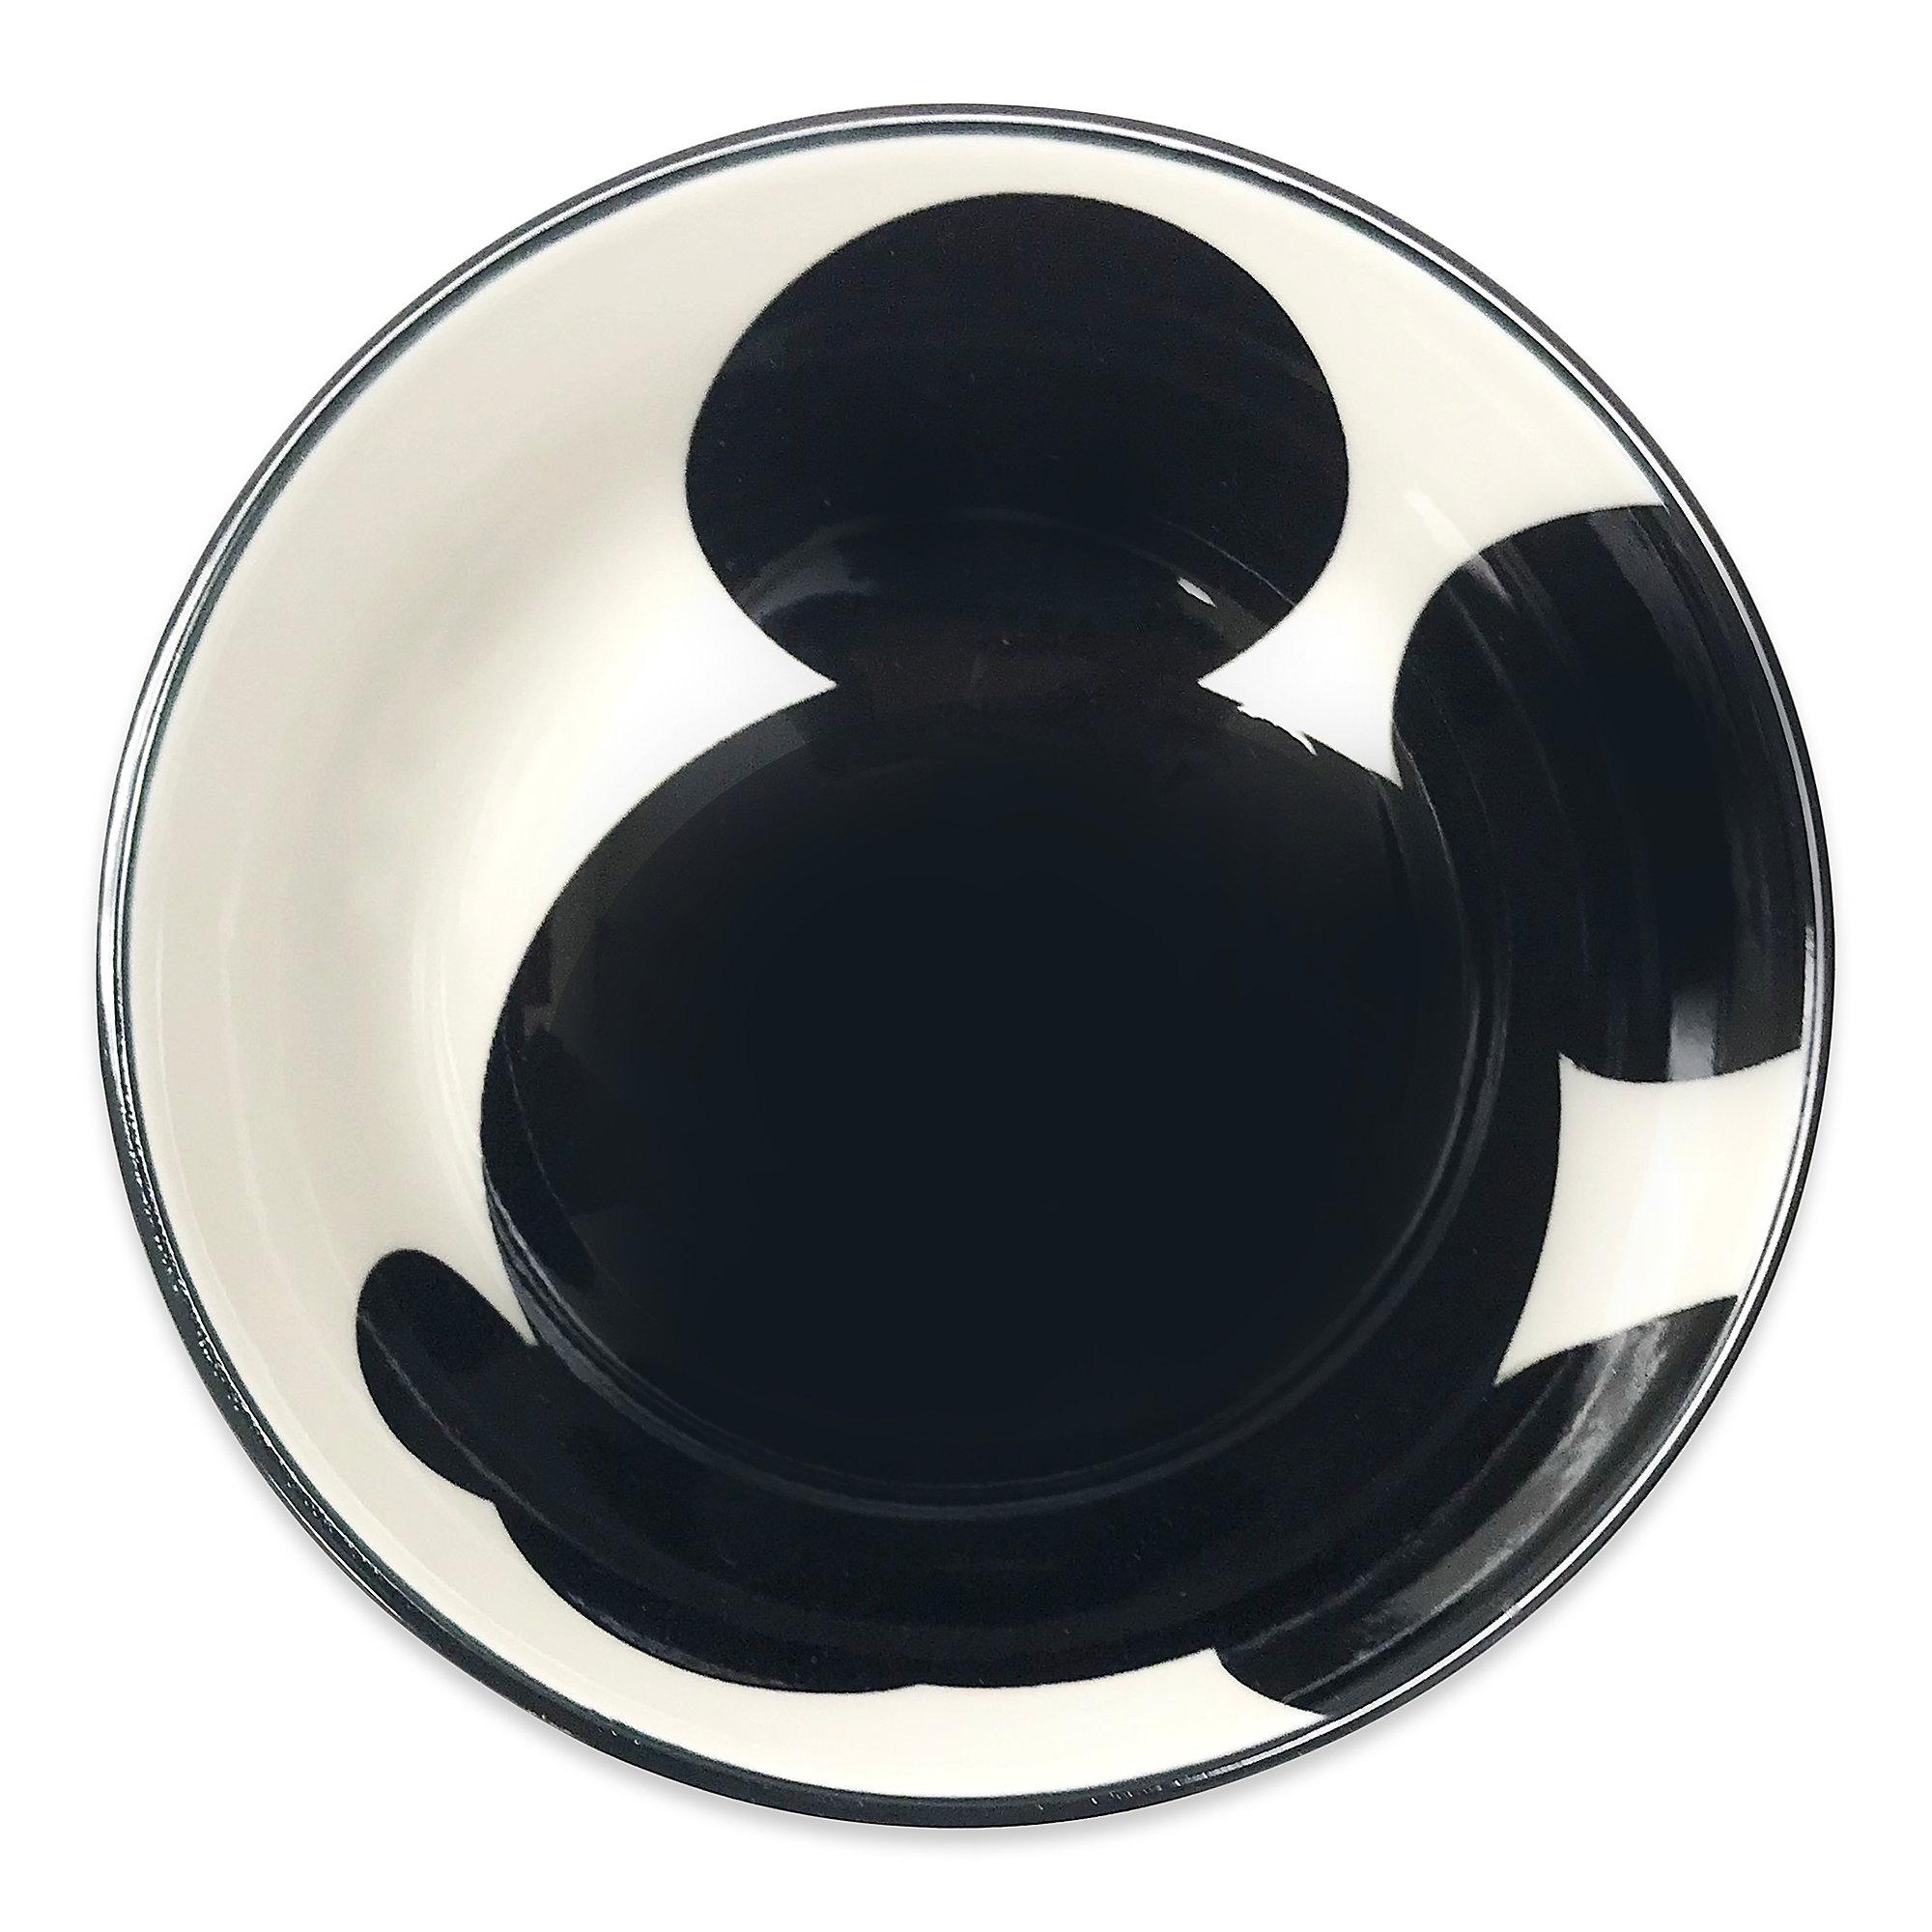 2000x2000 Mickey Mouse Silhouette Tidbit Bowl Shopdisney